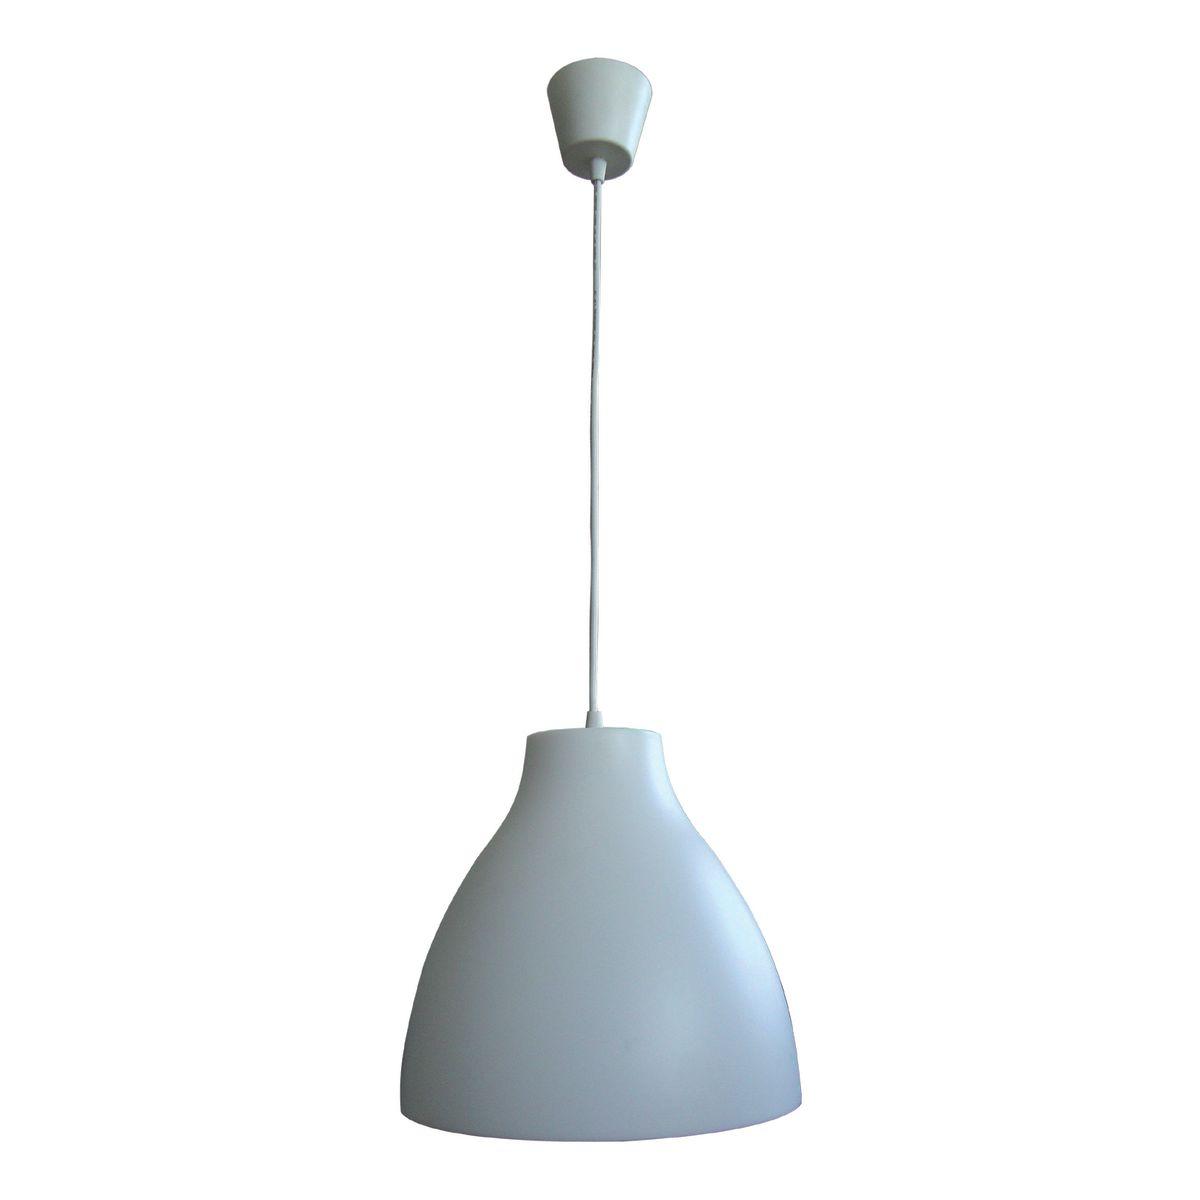 Le roy merlin lampadari awesome leroy merlin napoli for Lampadario camera da letto leroy merlin